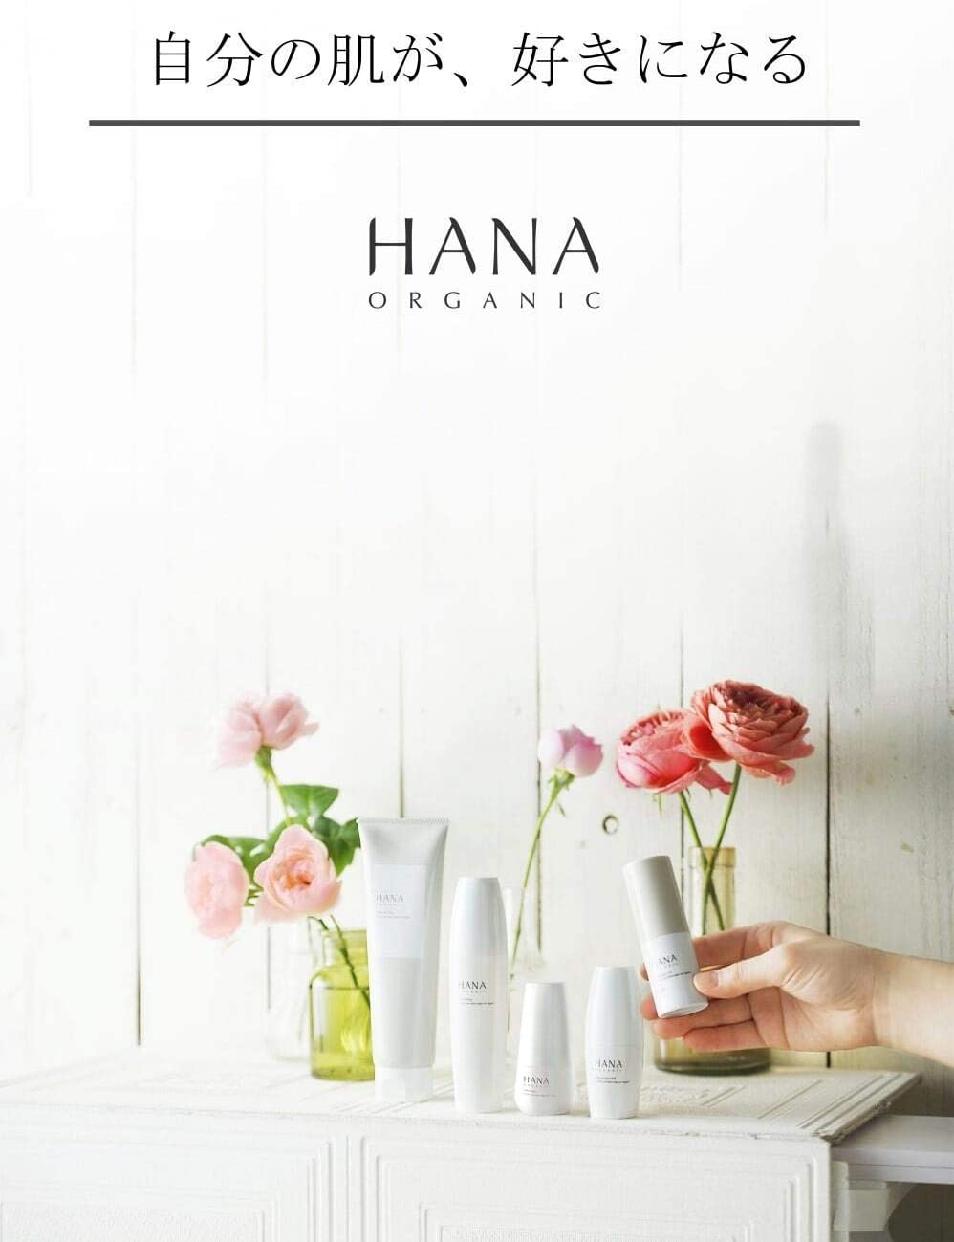 HANA オーガニック フローラルドロップの商品画像8